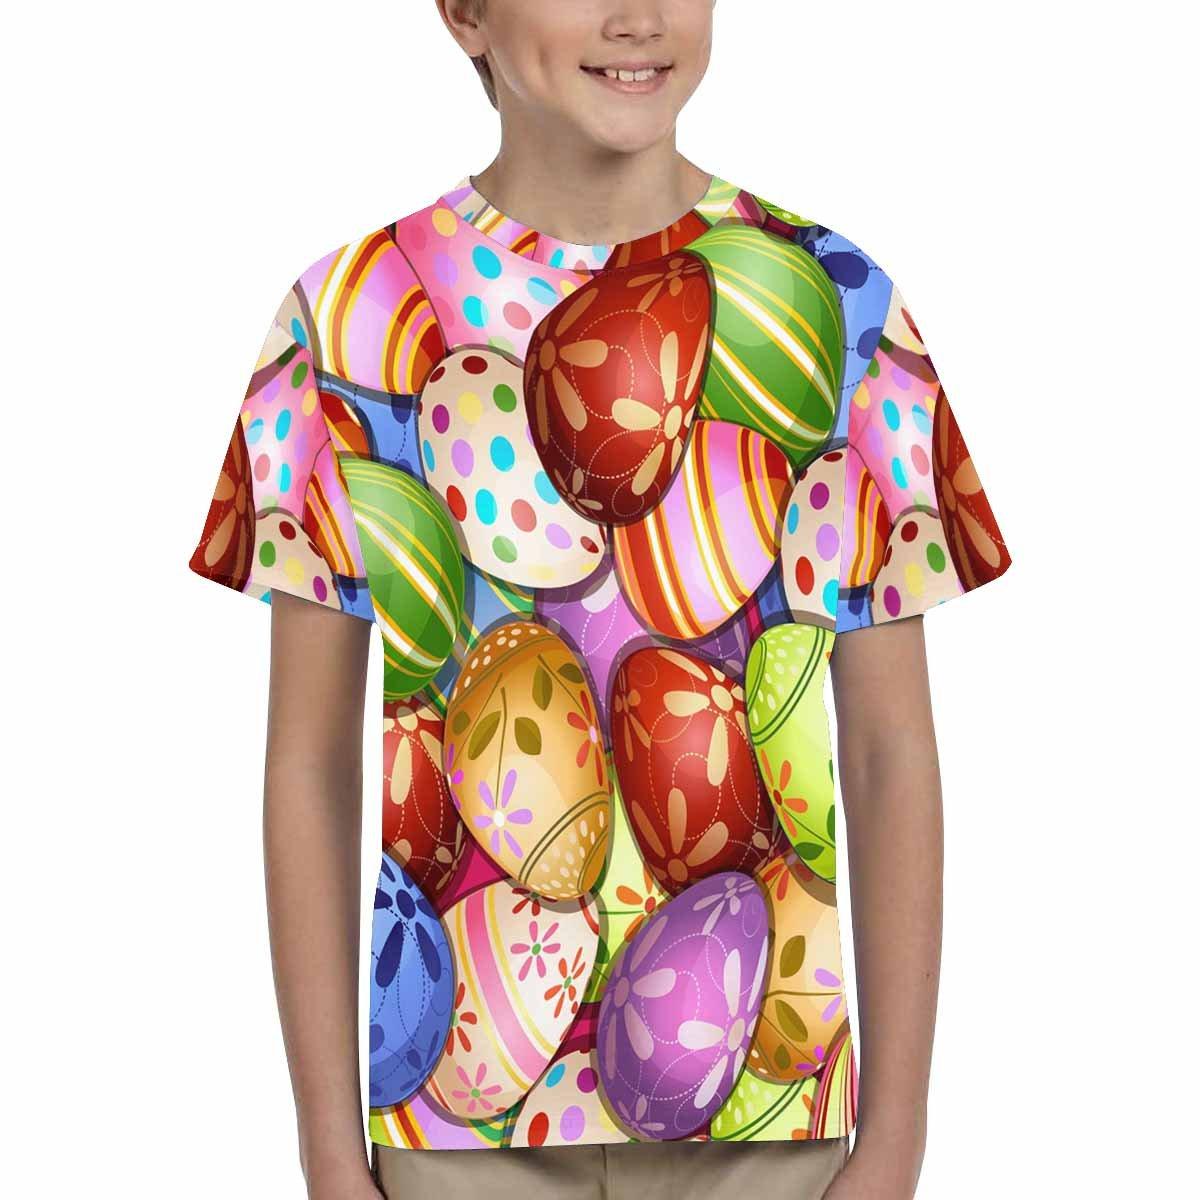 HADYKIDSLOVE Montana State Home Kids T-Shirt Long Sleeve Boys Girls T-Shirt